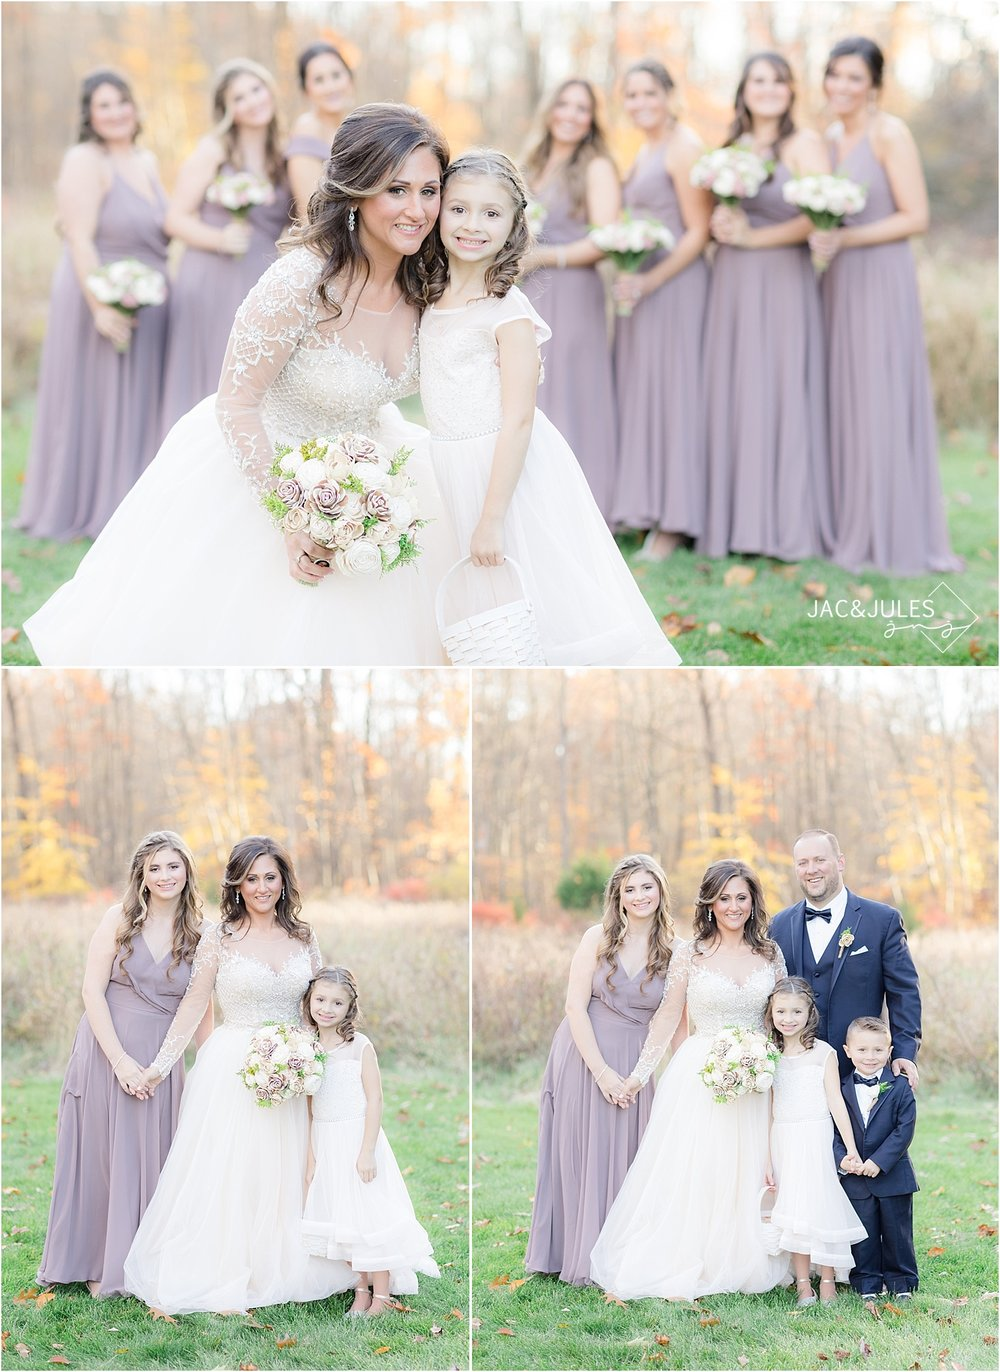 family photo at Perona Farms wedding